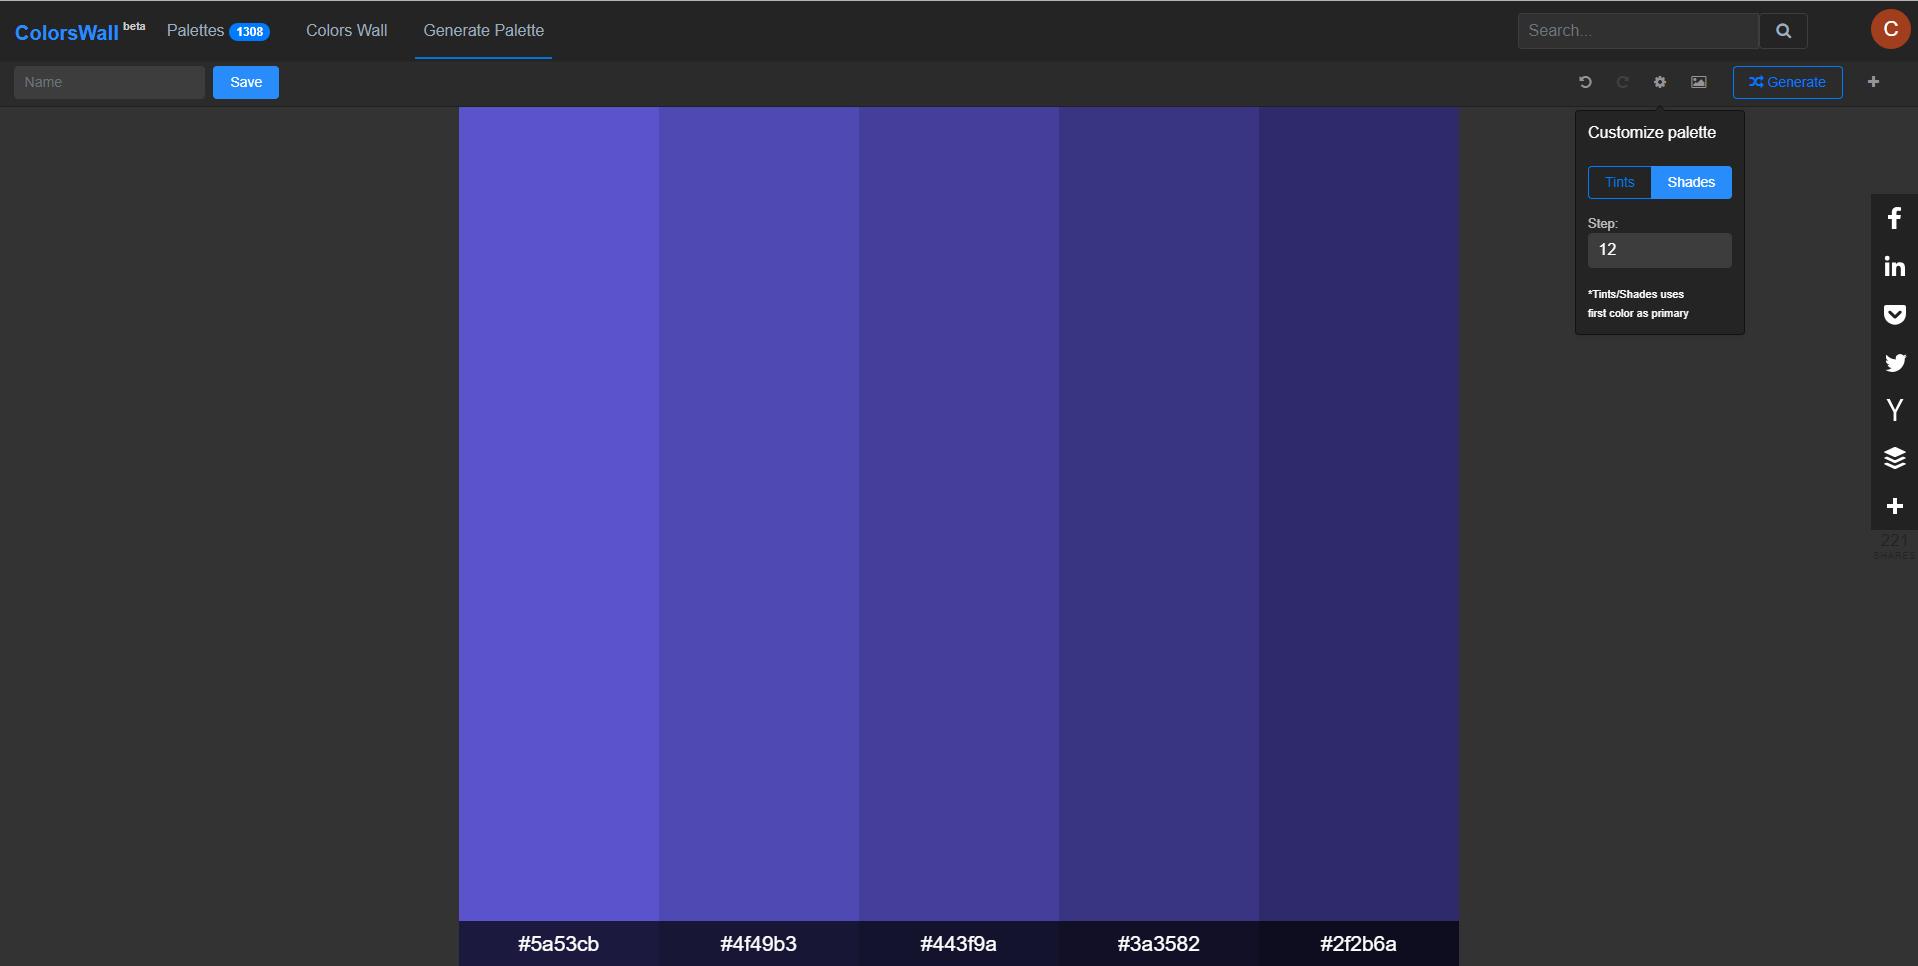 Blue shades palette